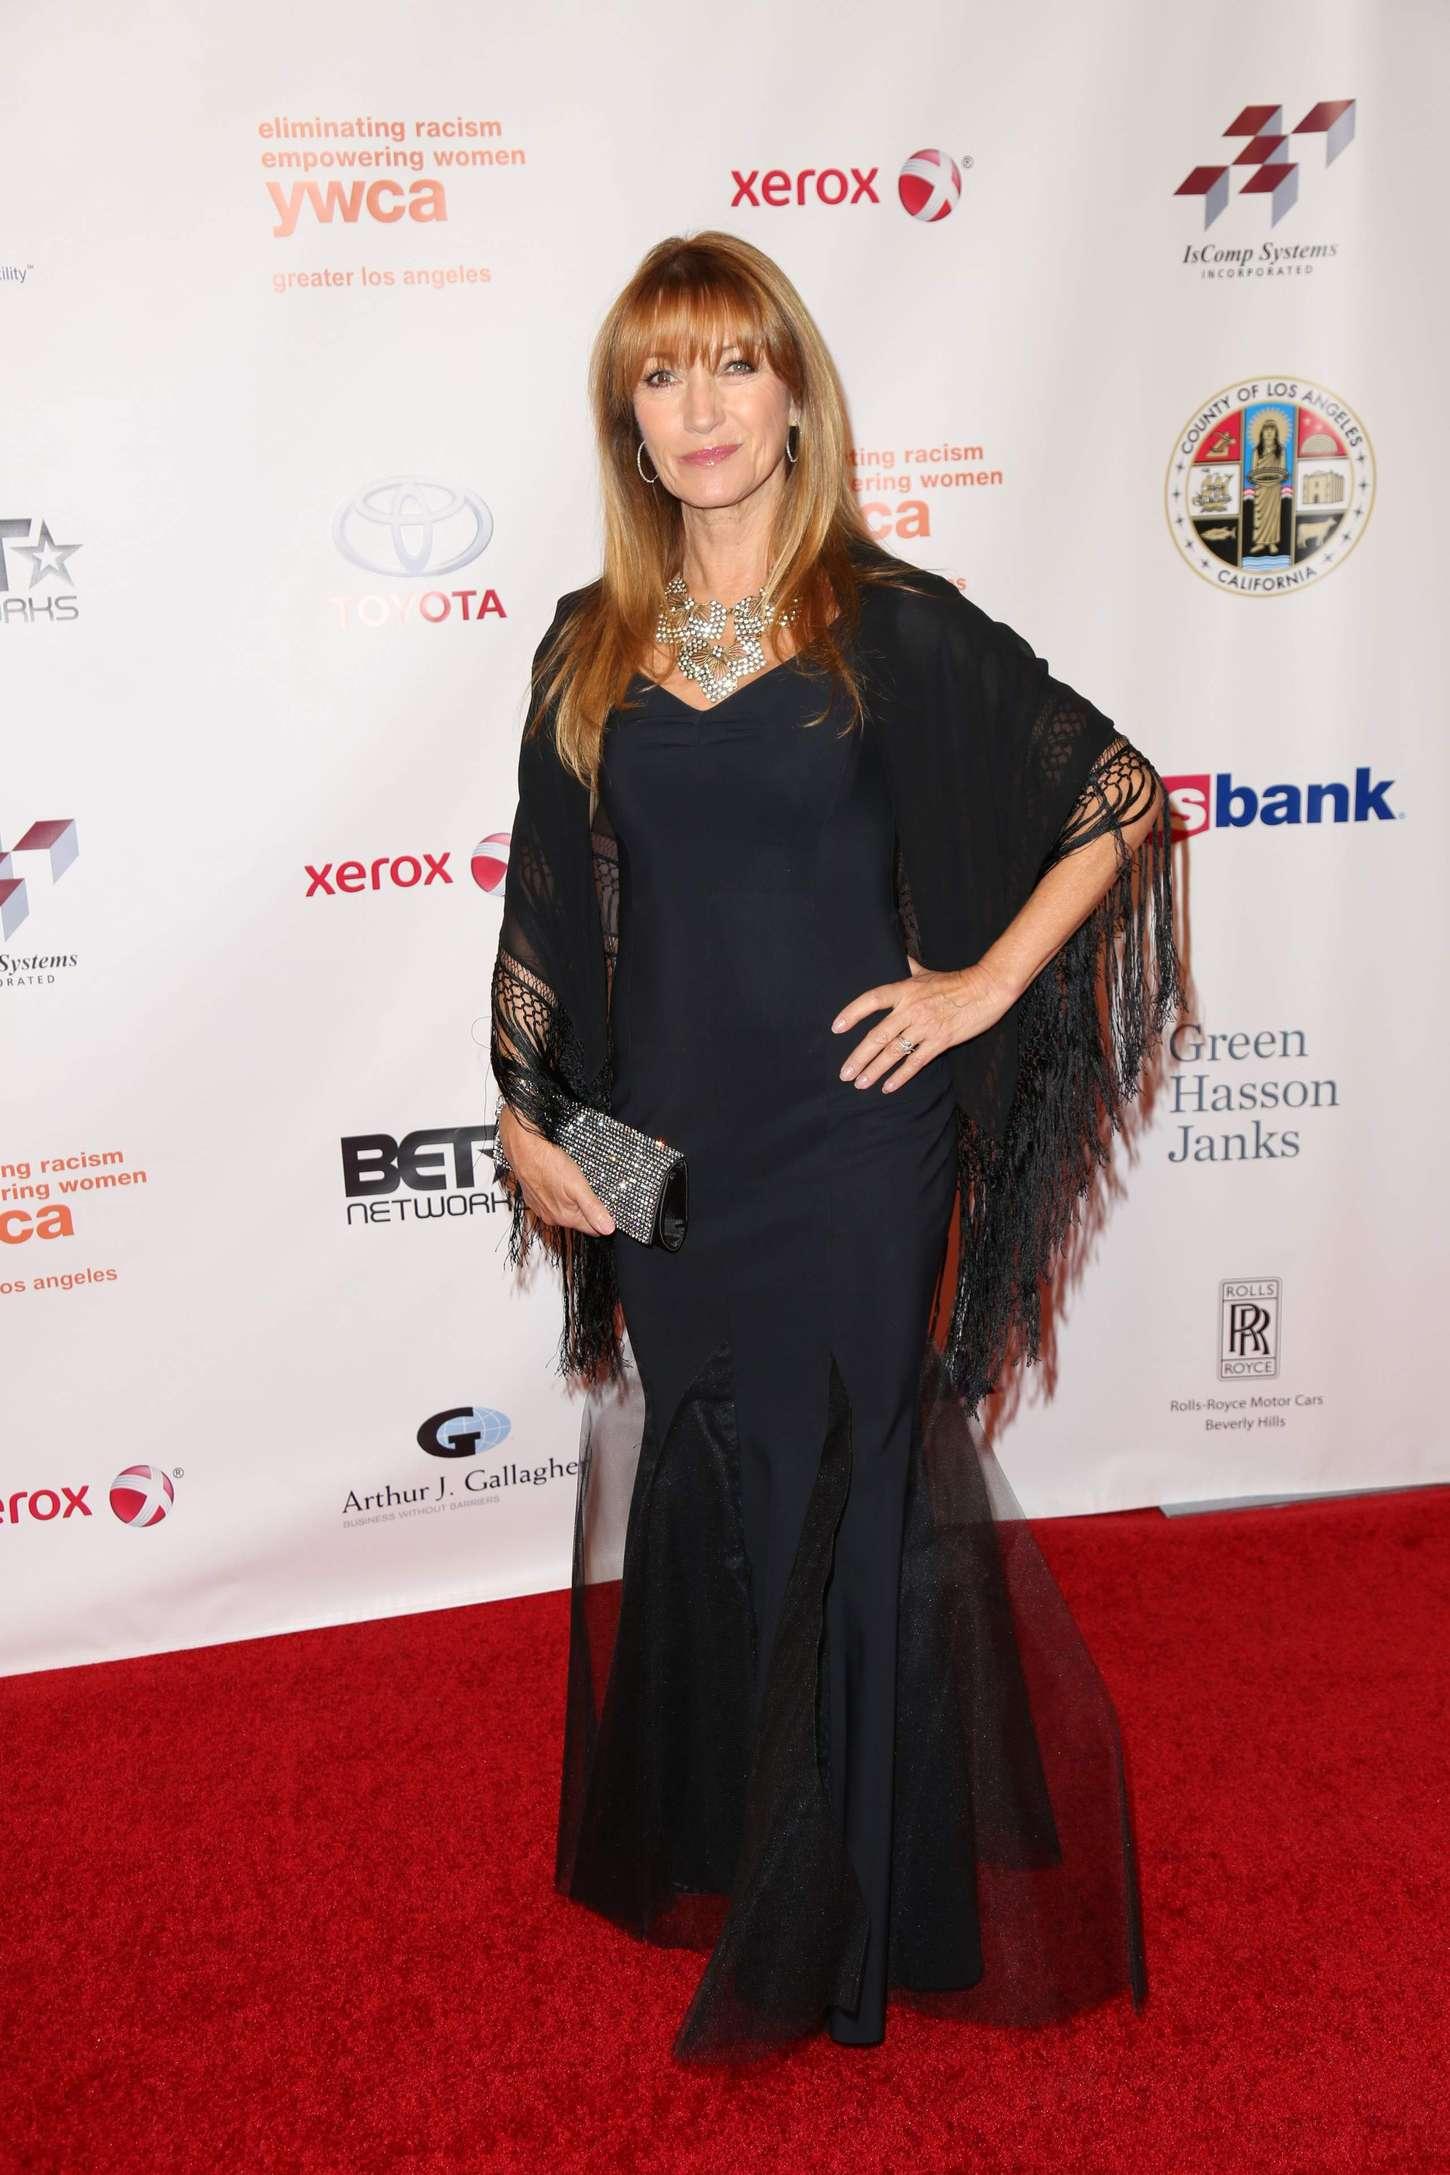 Jane Seymour YWCA GLA Annual Rhapsody Gala in Beverly Hills